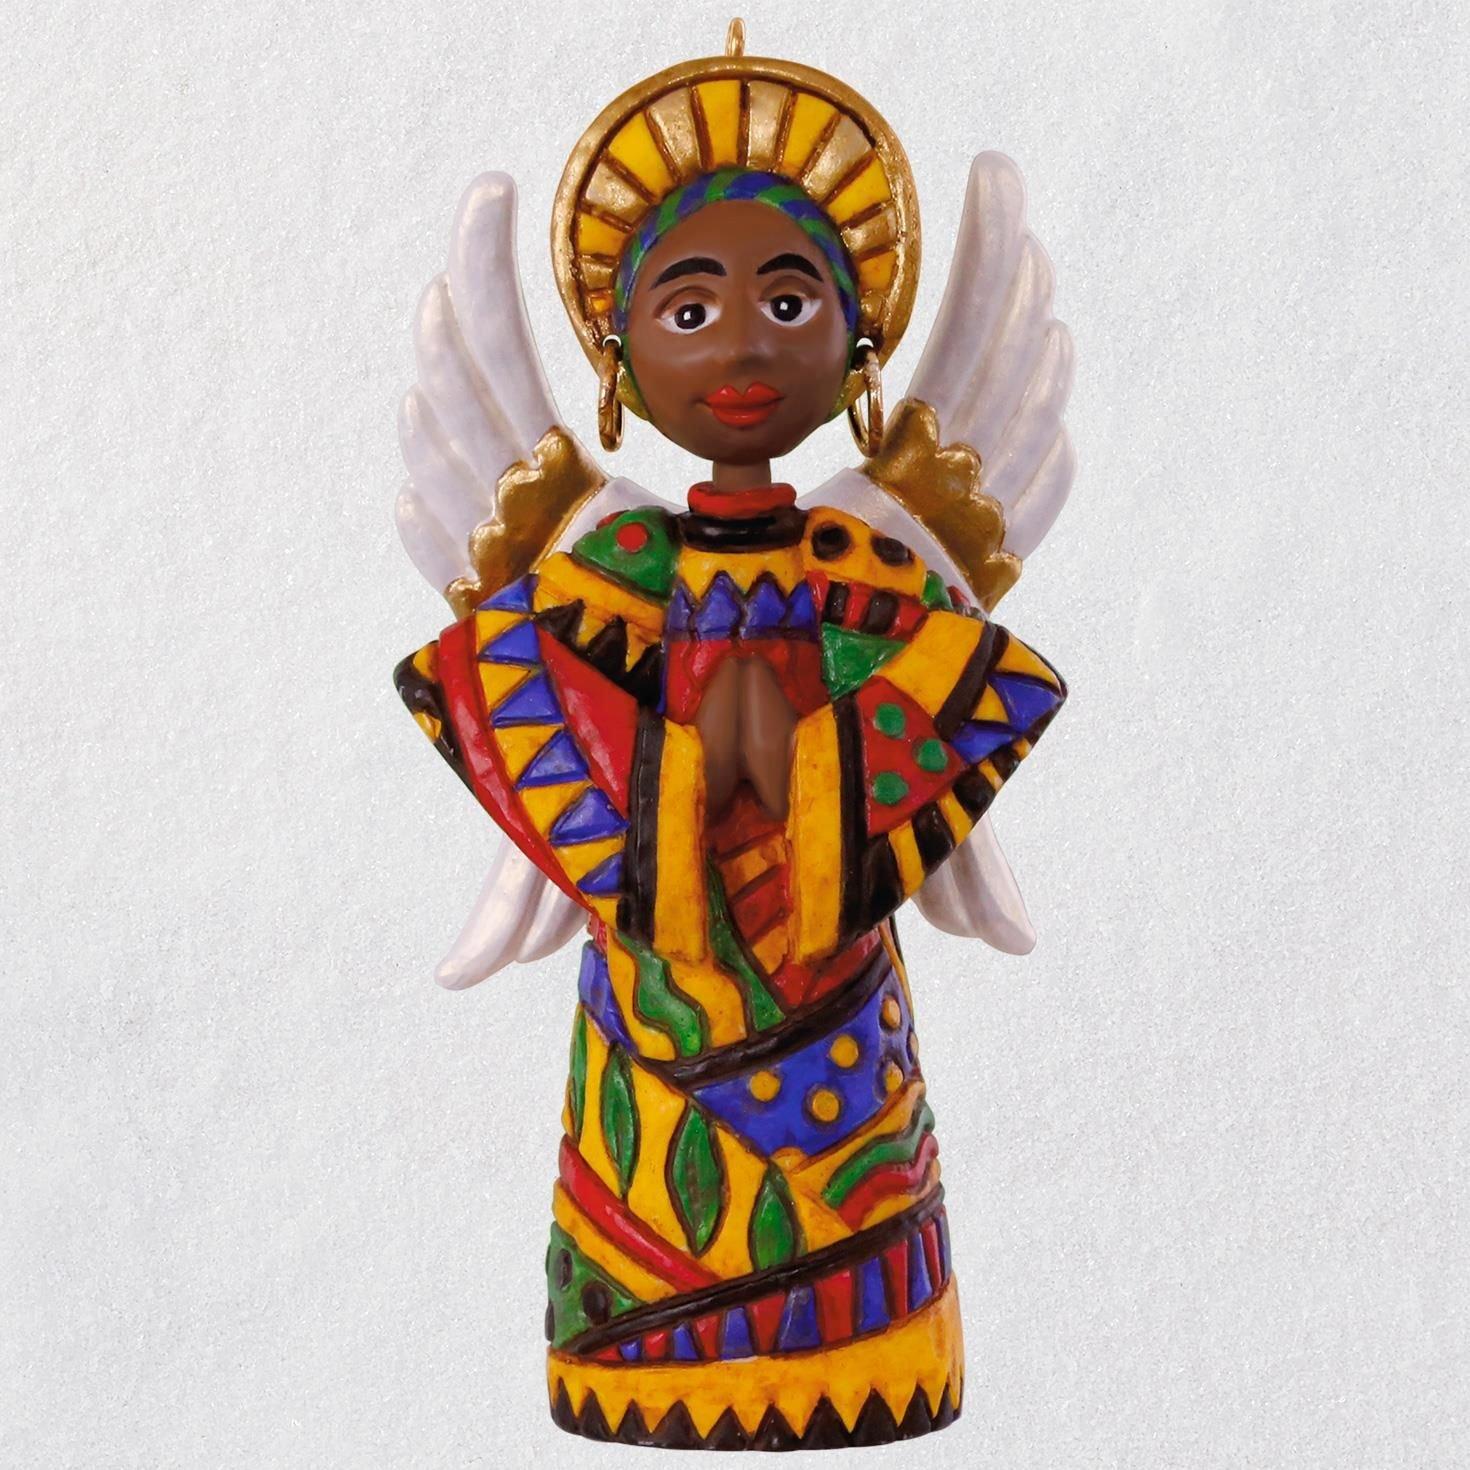 Hallmark Keepsake Christmas Ornament 2018 Year Dated, African American, Angel of Hope